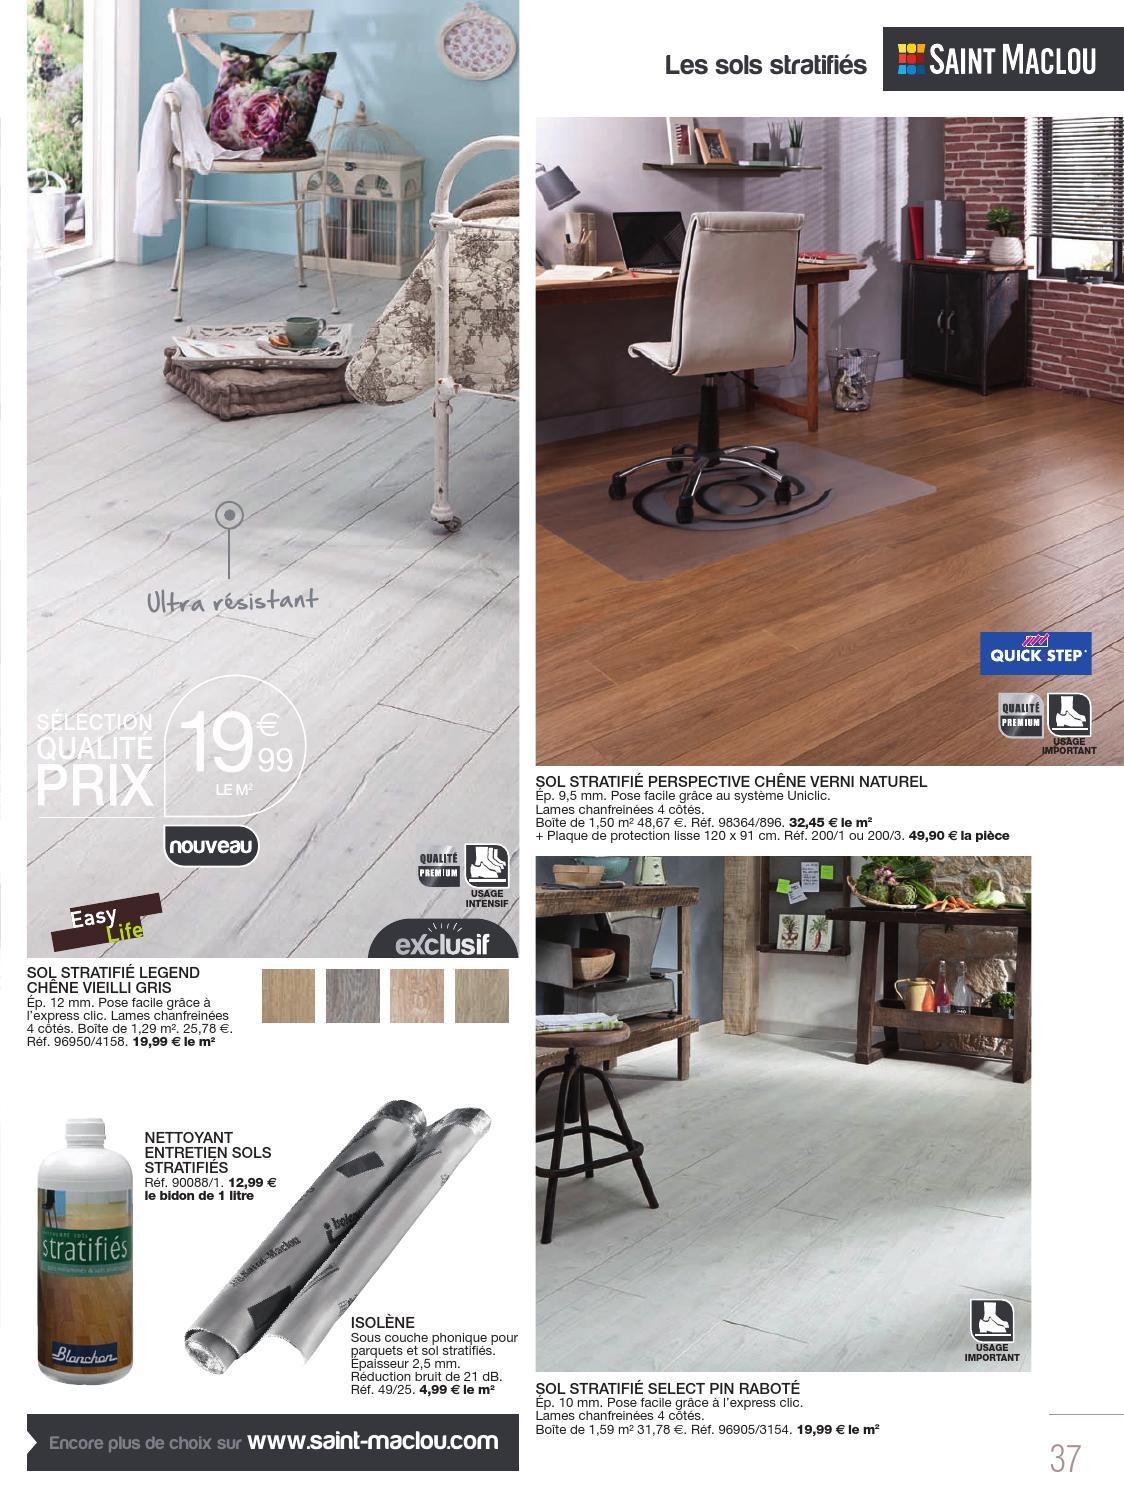 Catalogue Saint Maclou - Collection 2013/2014 By Joe ... tout Isolene 49/25